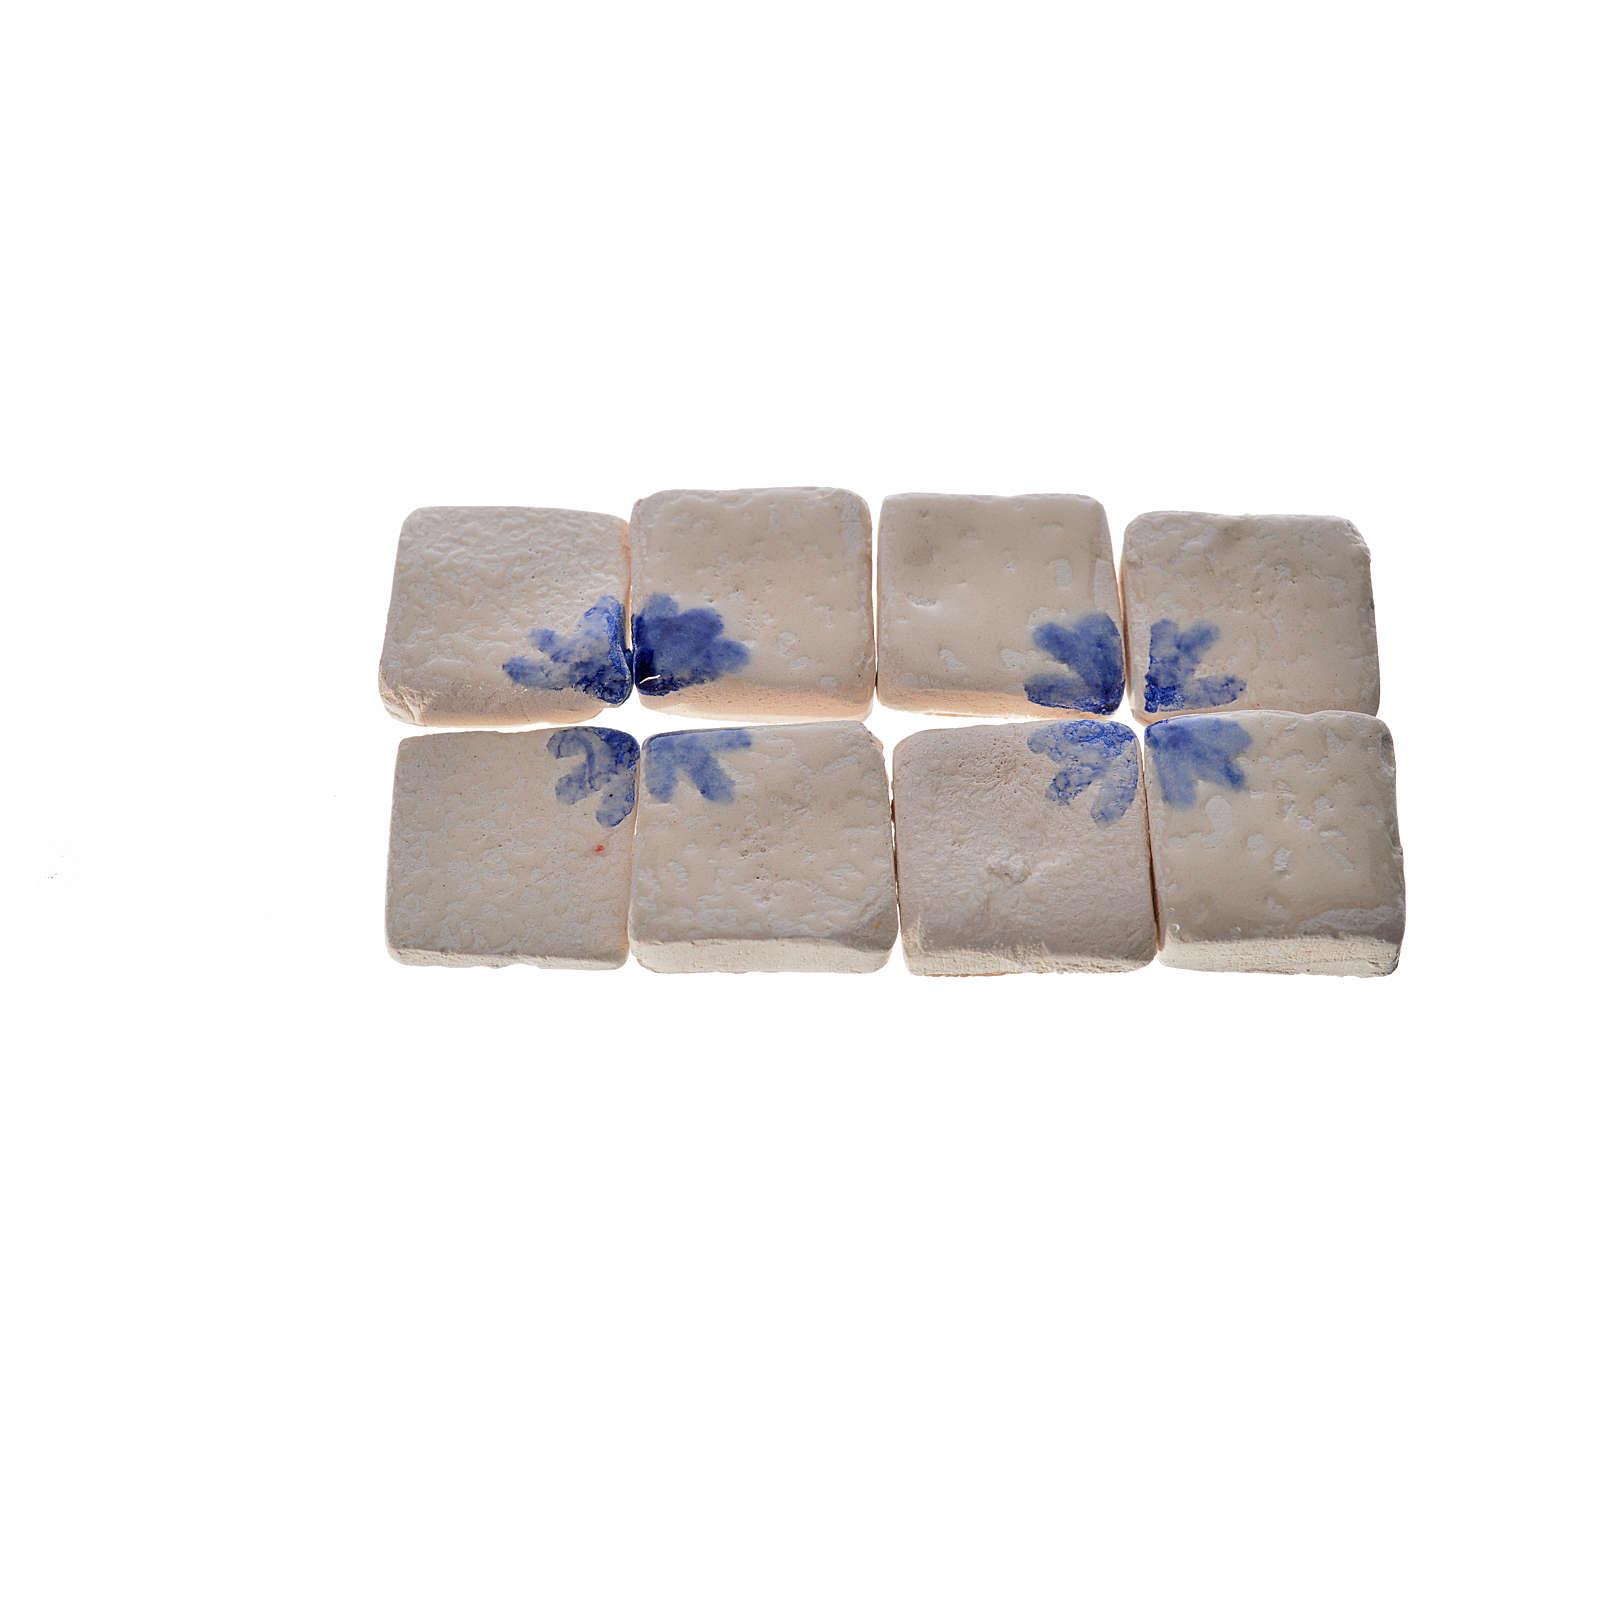 Nativity accessory, enamelled terracotta tiles, 60pcs, blue arro 4